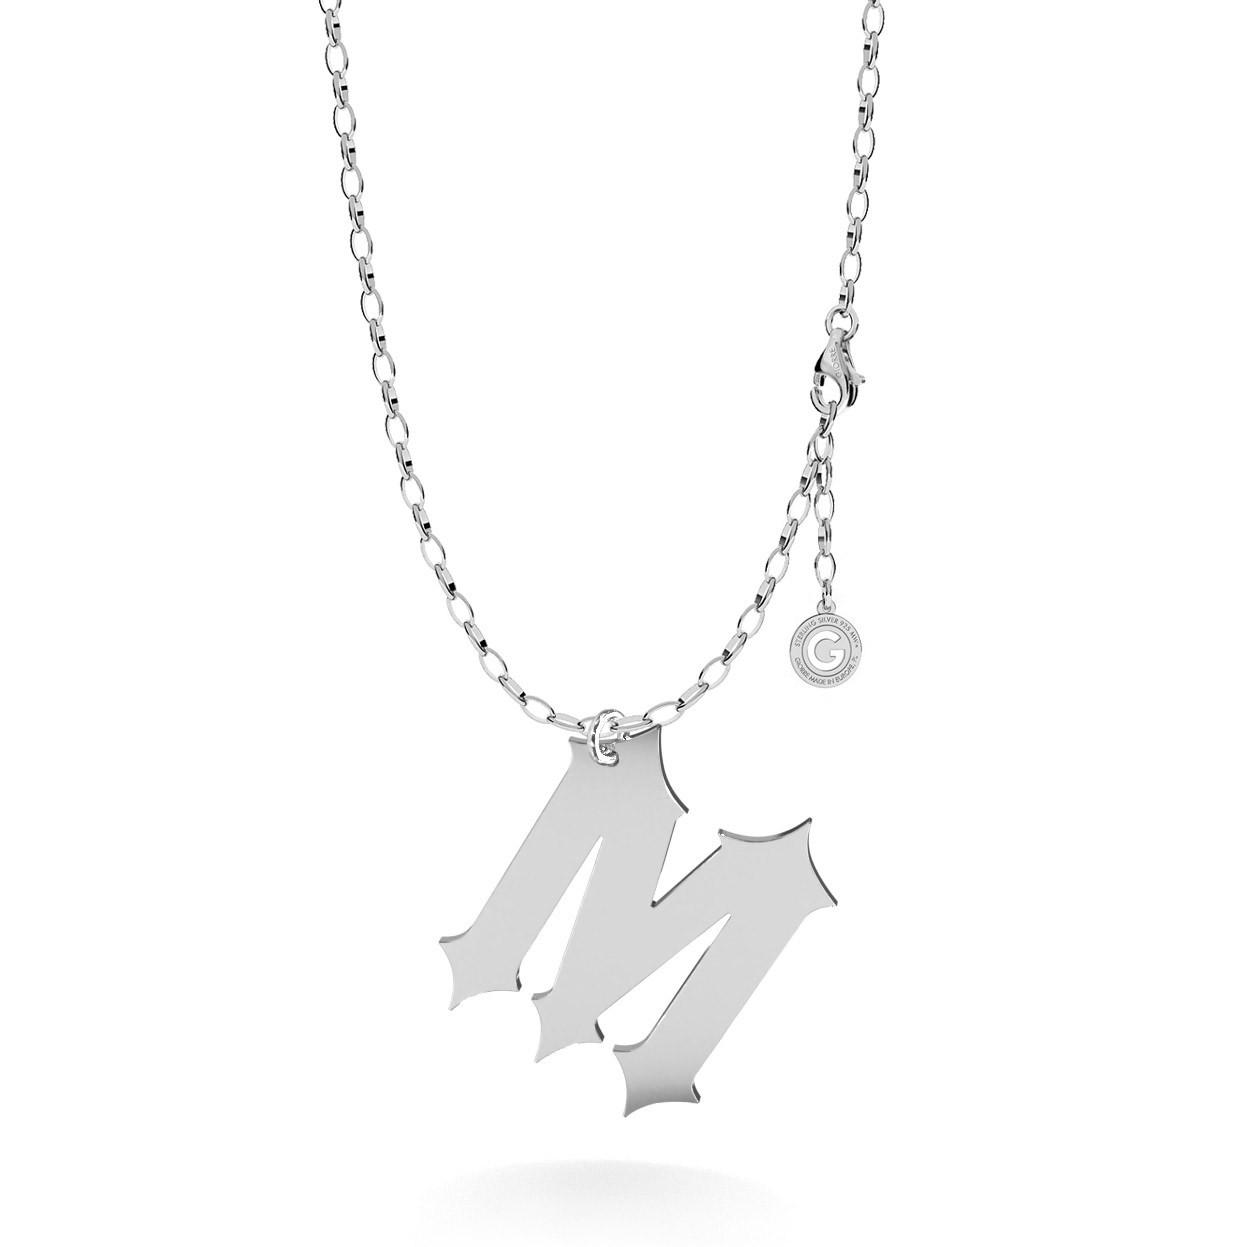 Srebrny naszyjnik z dużą literką, alfabet, srebro 925